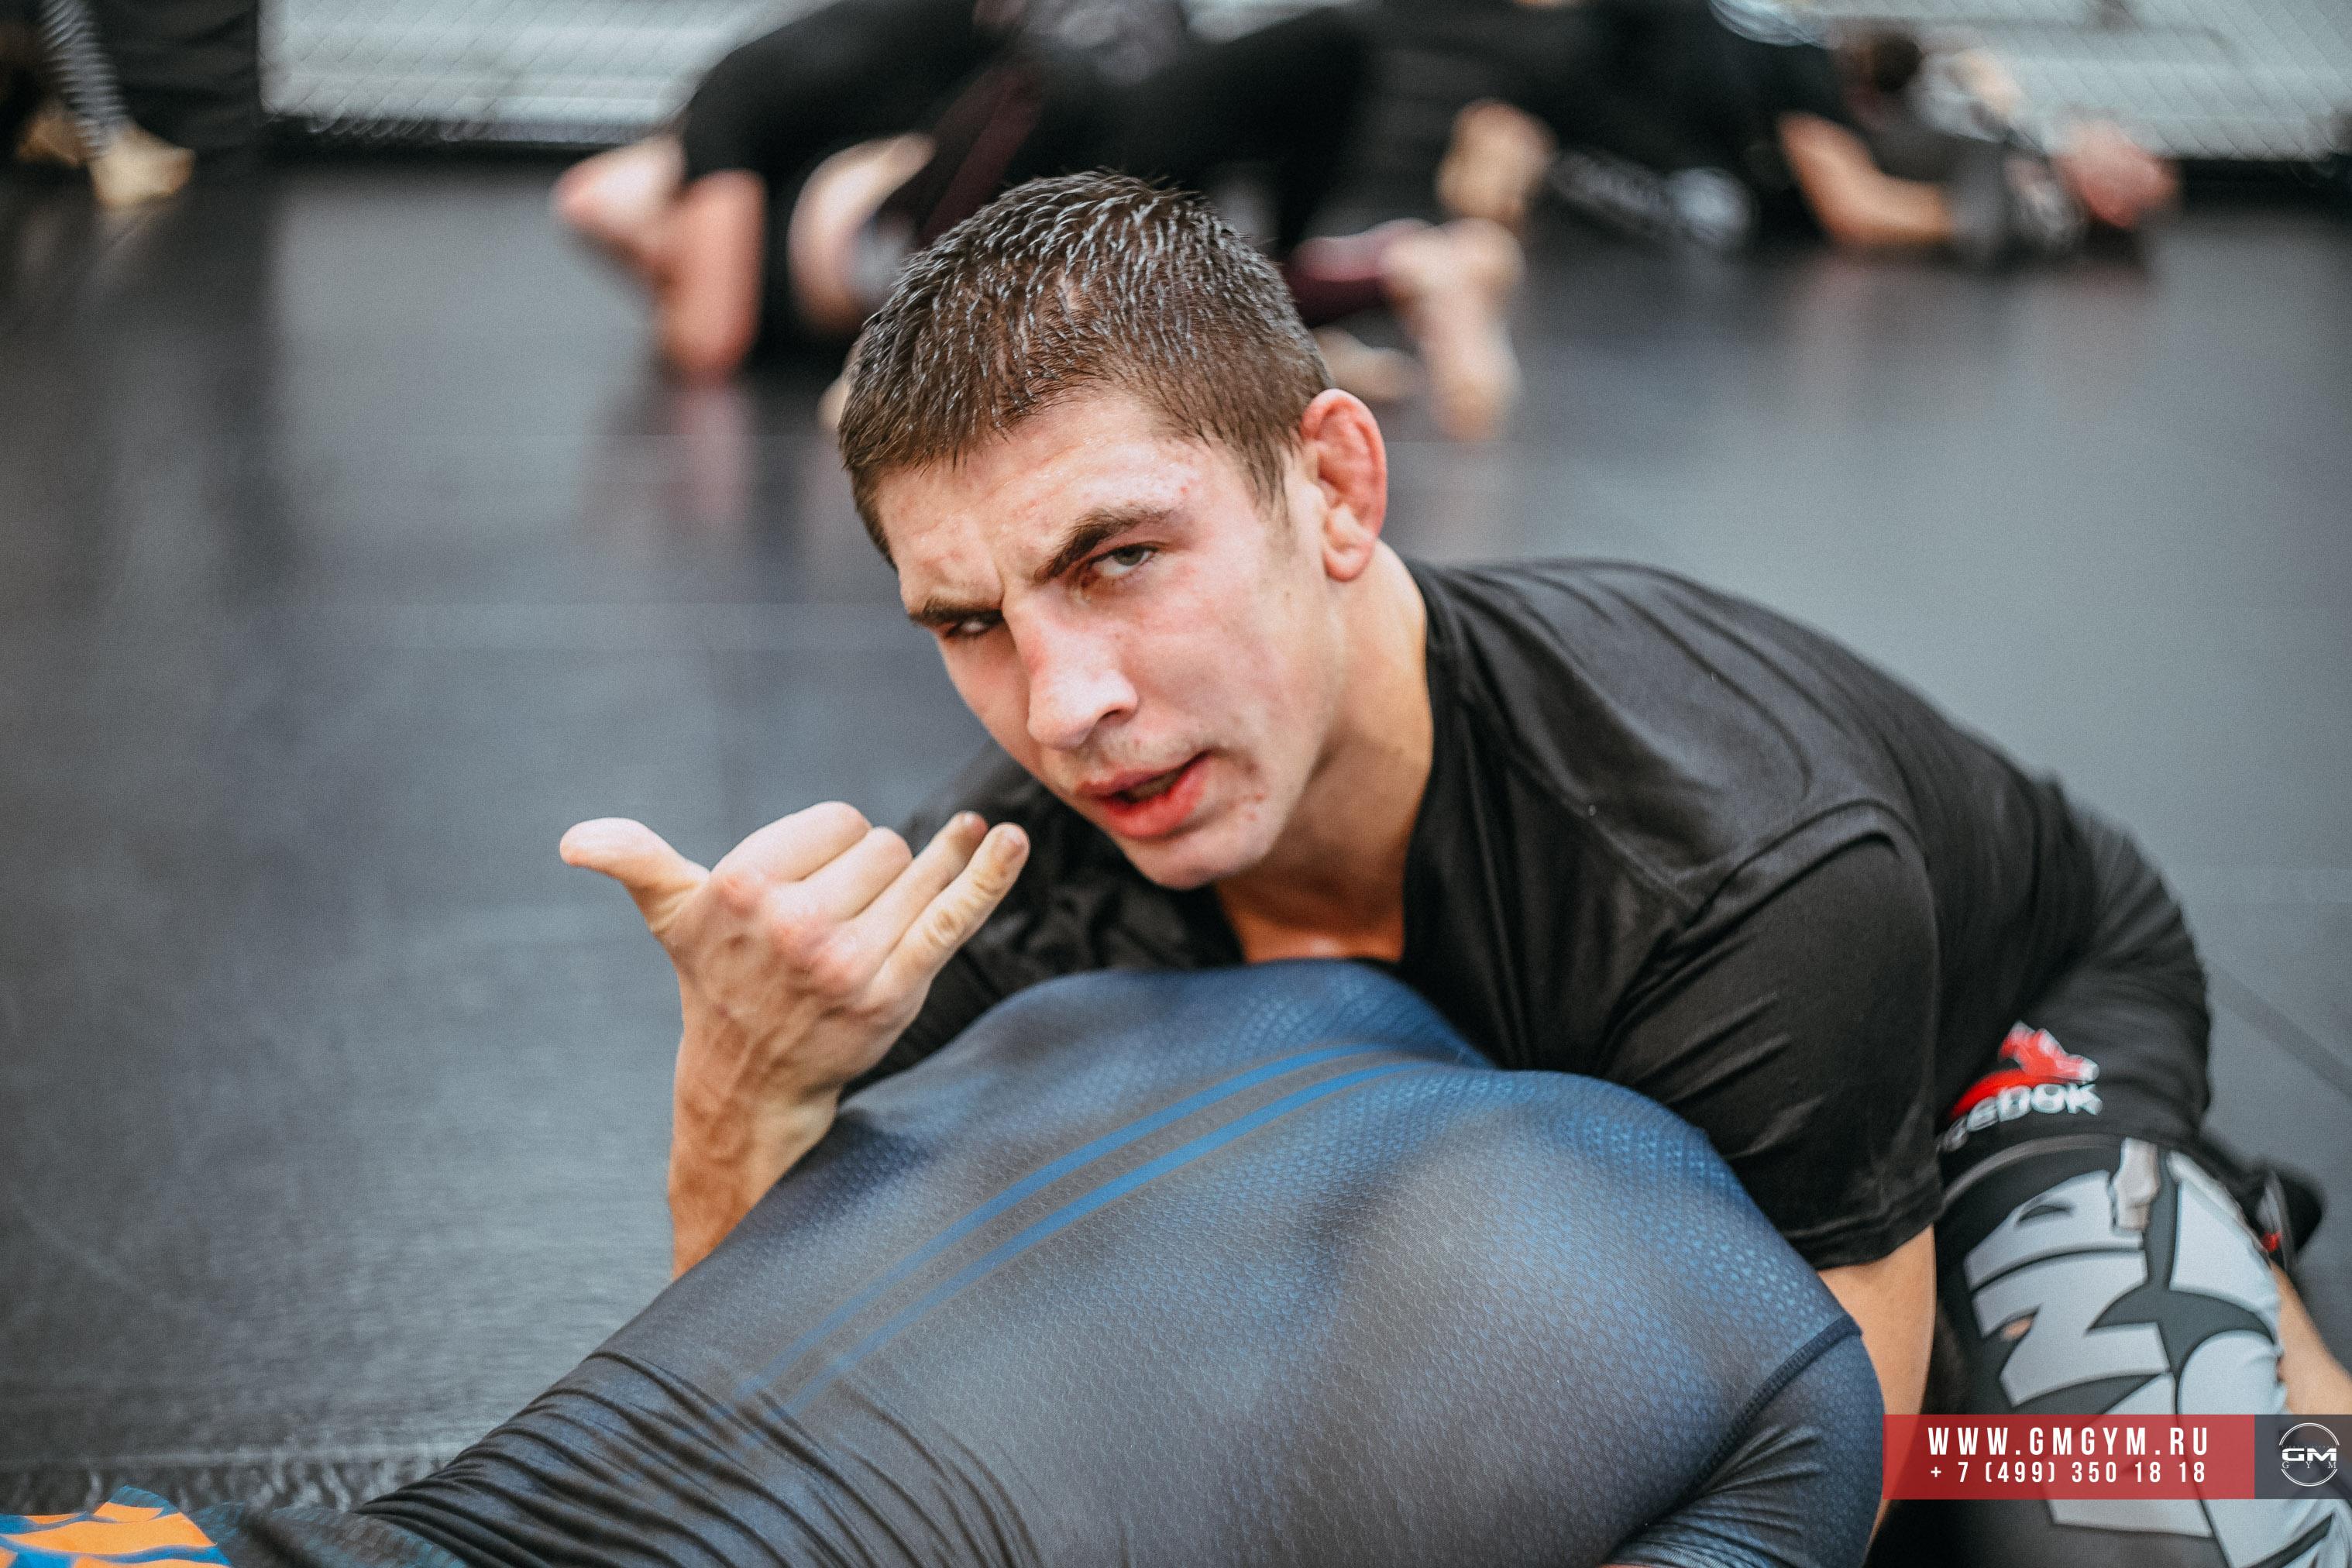 Виталий Слипенко тренер по ММА 10